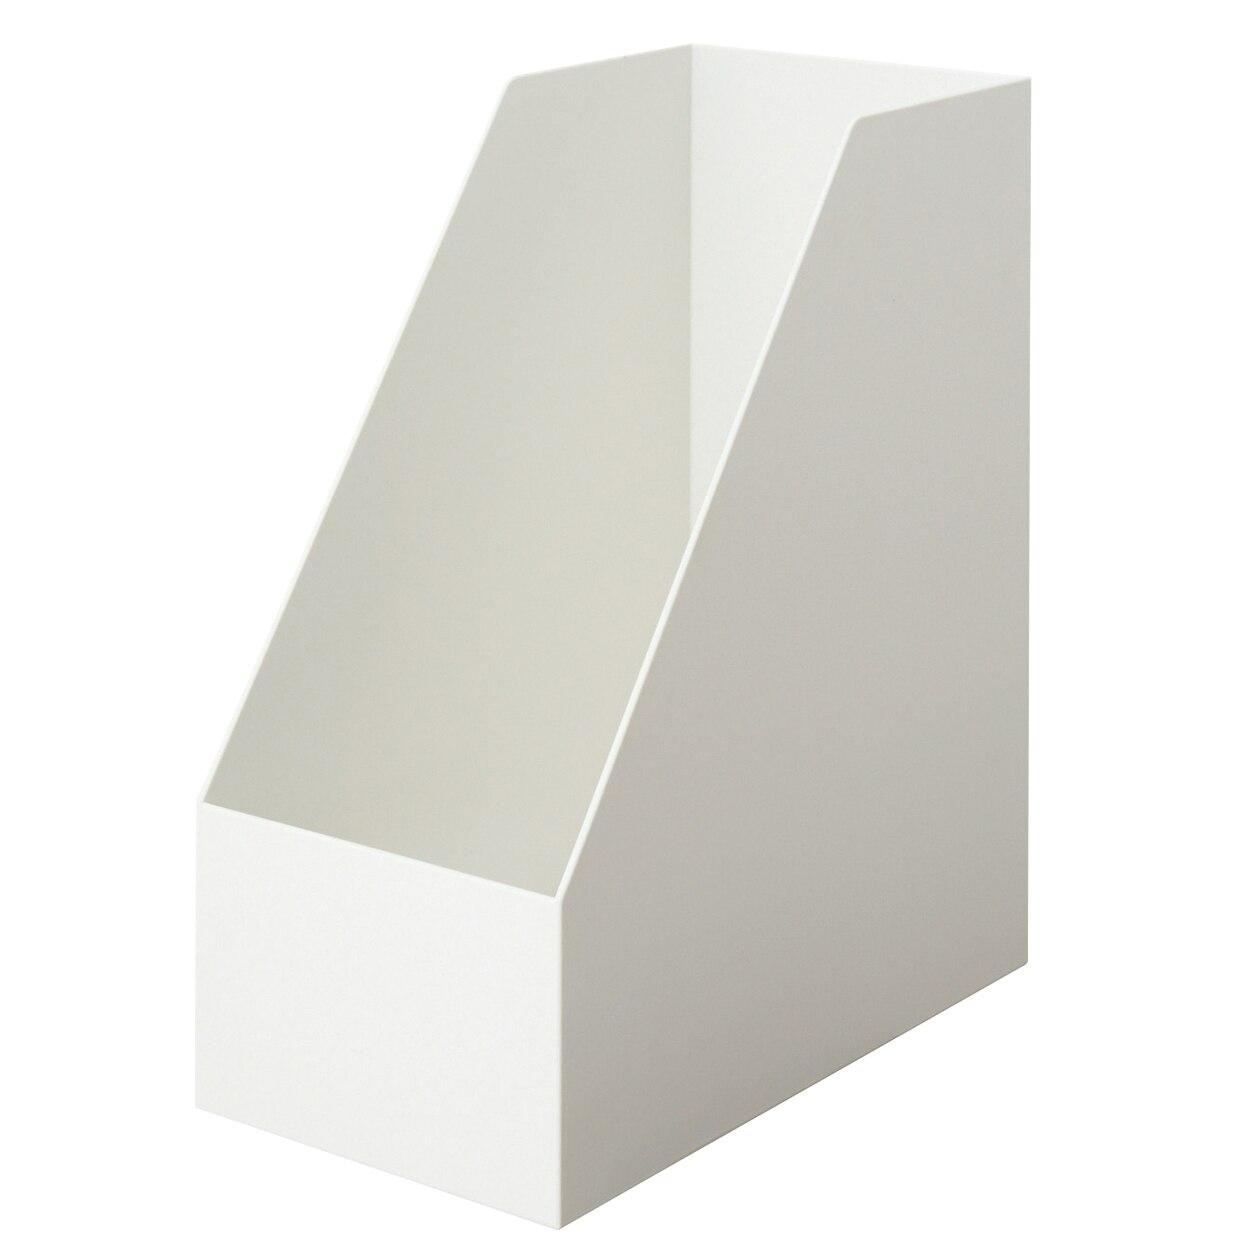 PP立式檔案盒/斜口.寬 白灰約15×27.6×31.8cm | 無印良品